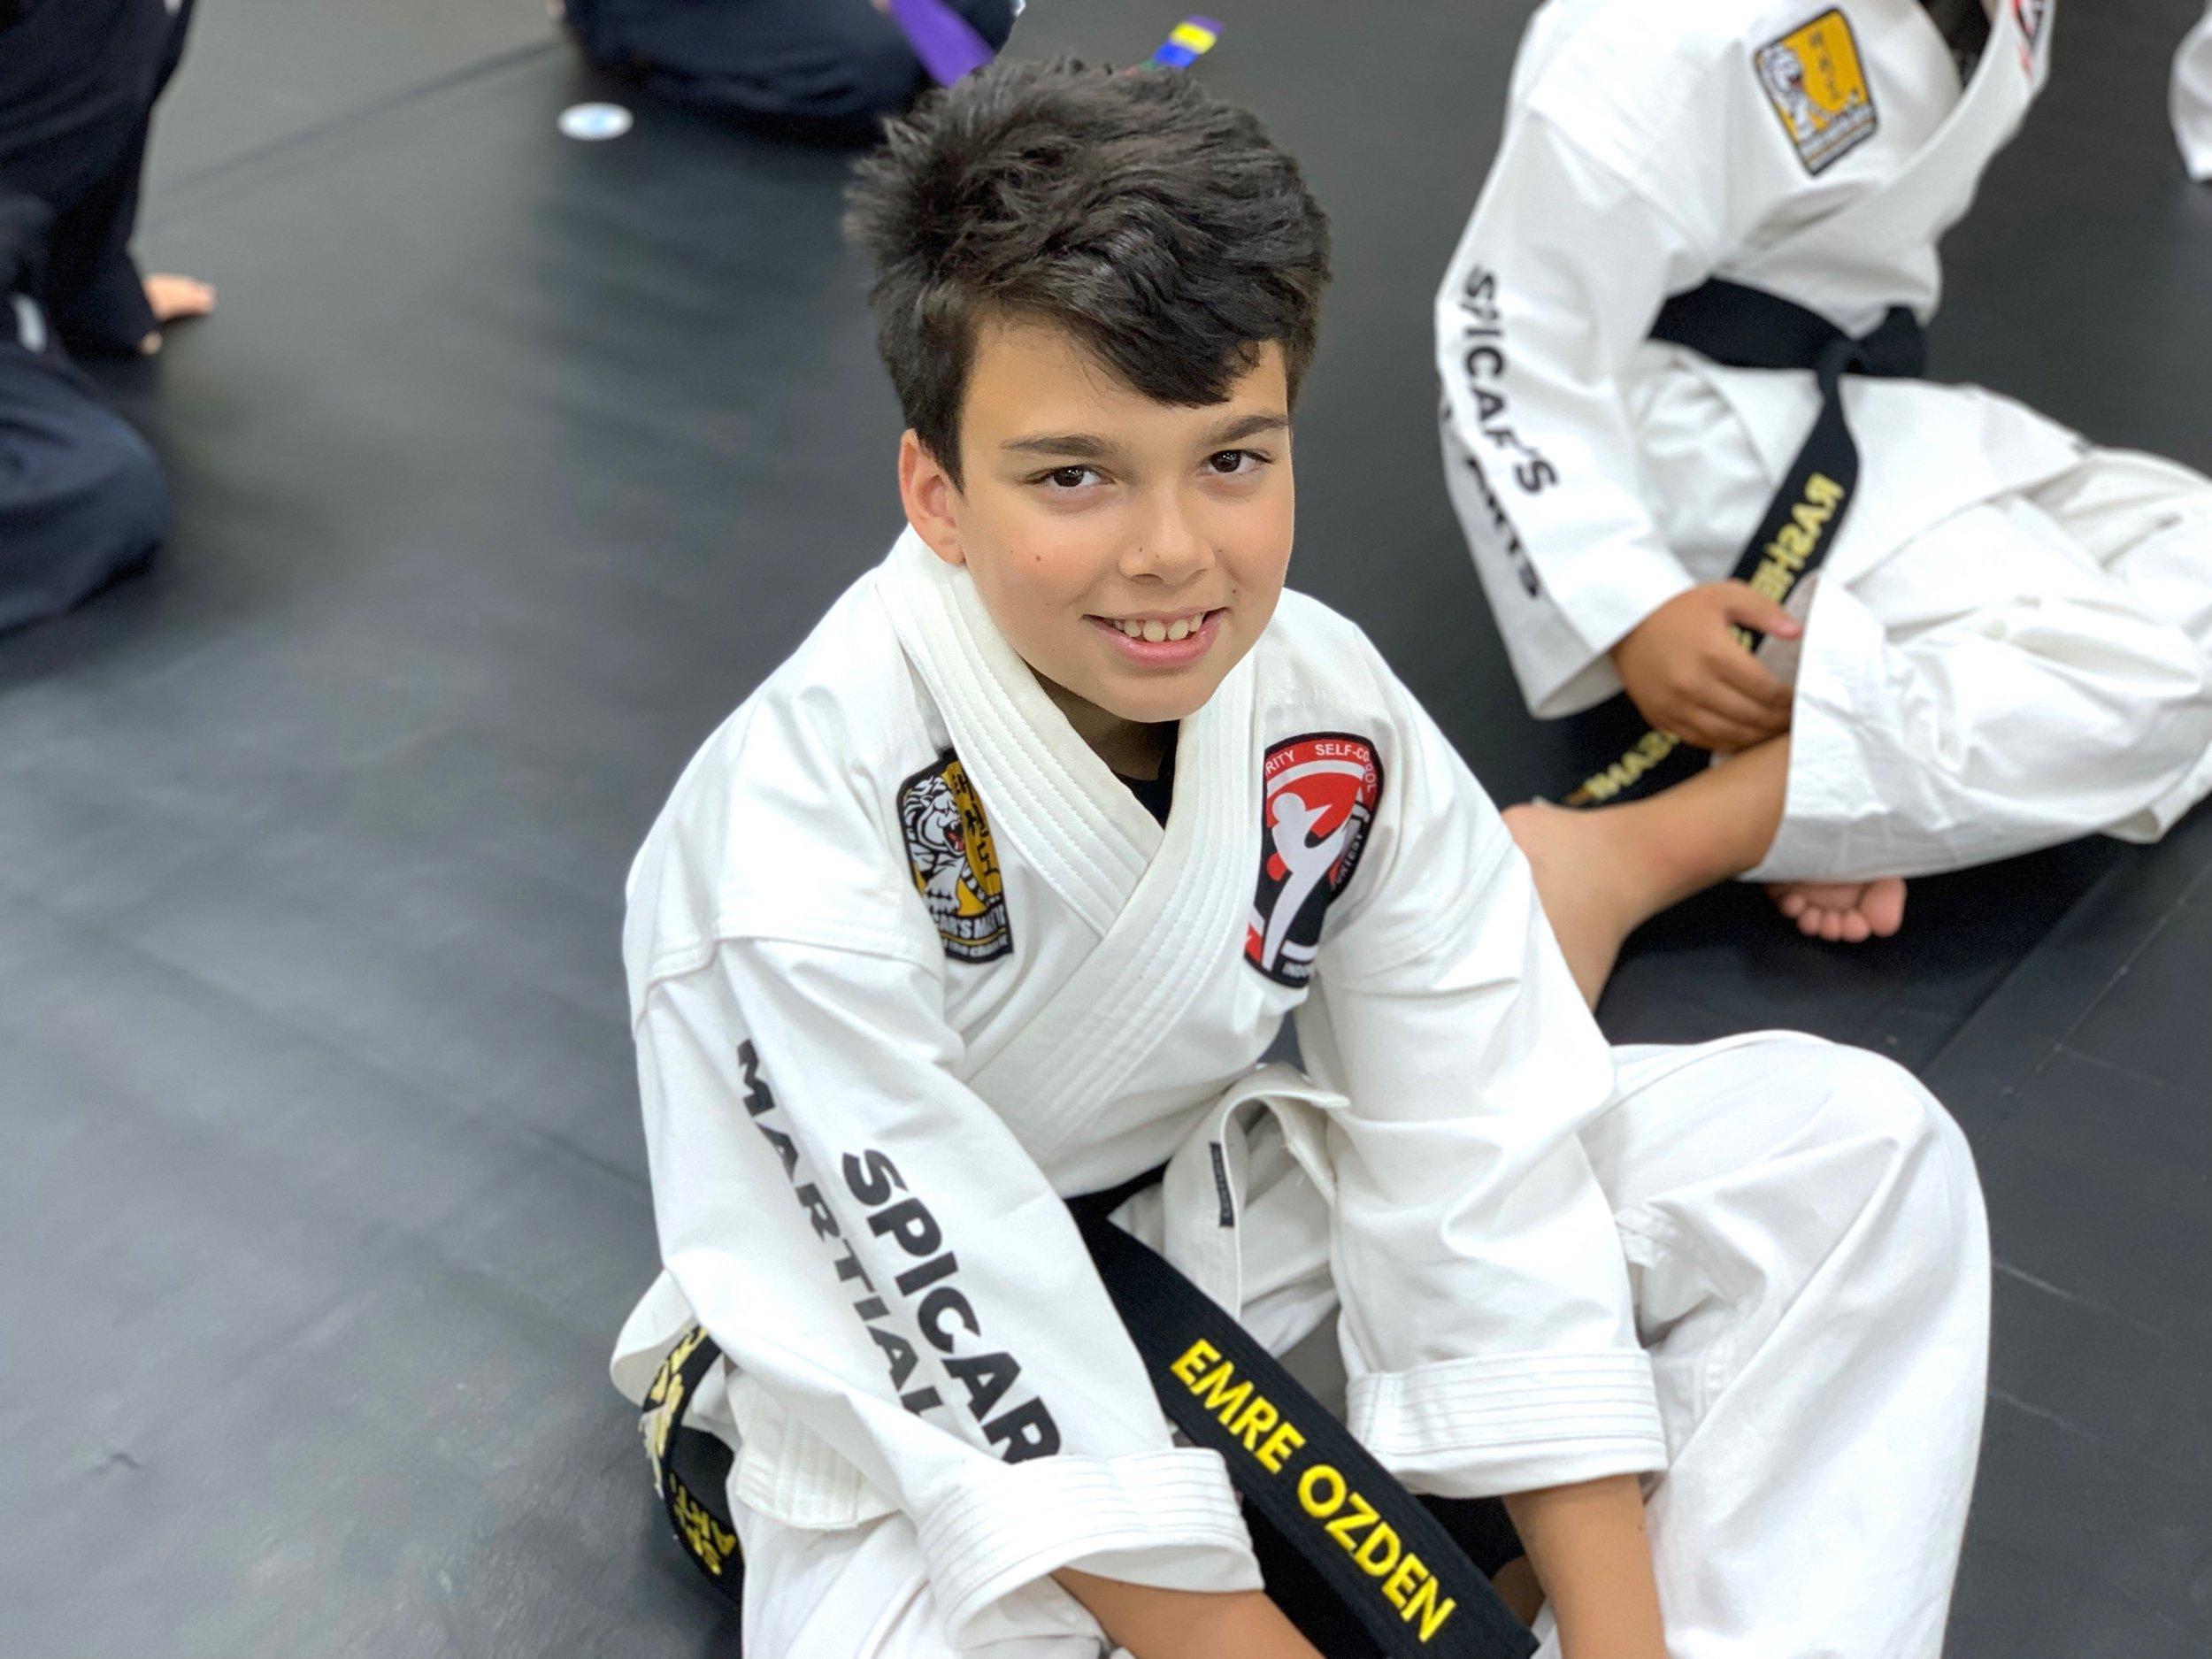 karate-kids-program-souhtlake-keller-grapevine-texas00026.jpeg